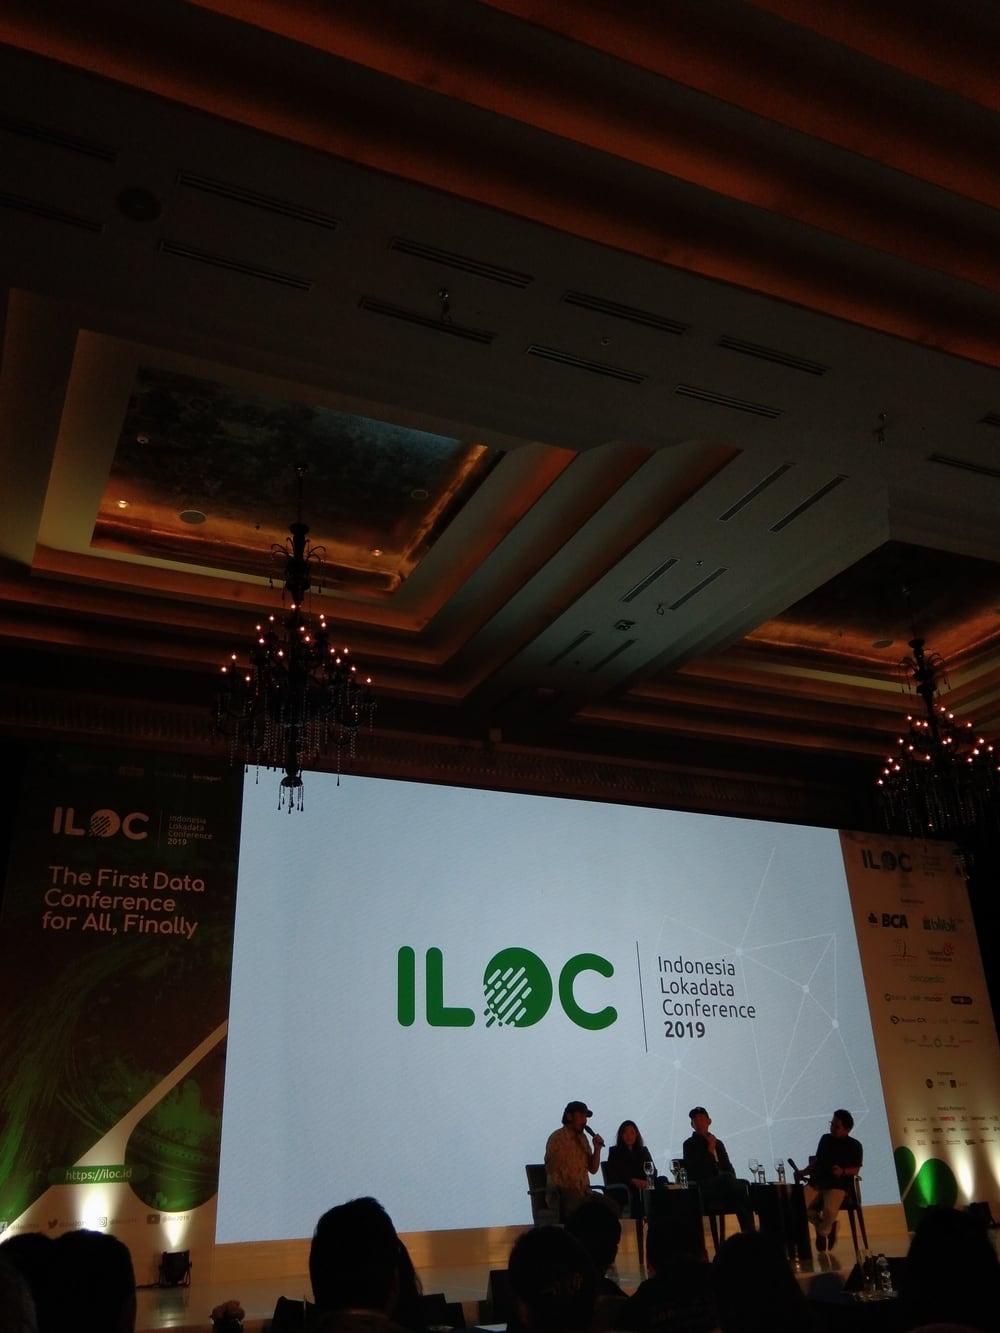 Mengupas Data di 'ILOC' Konferensi Lokadata Indonesia